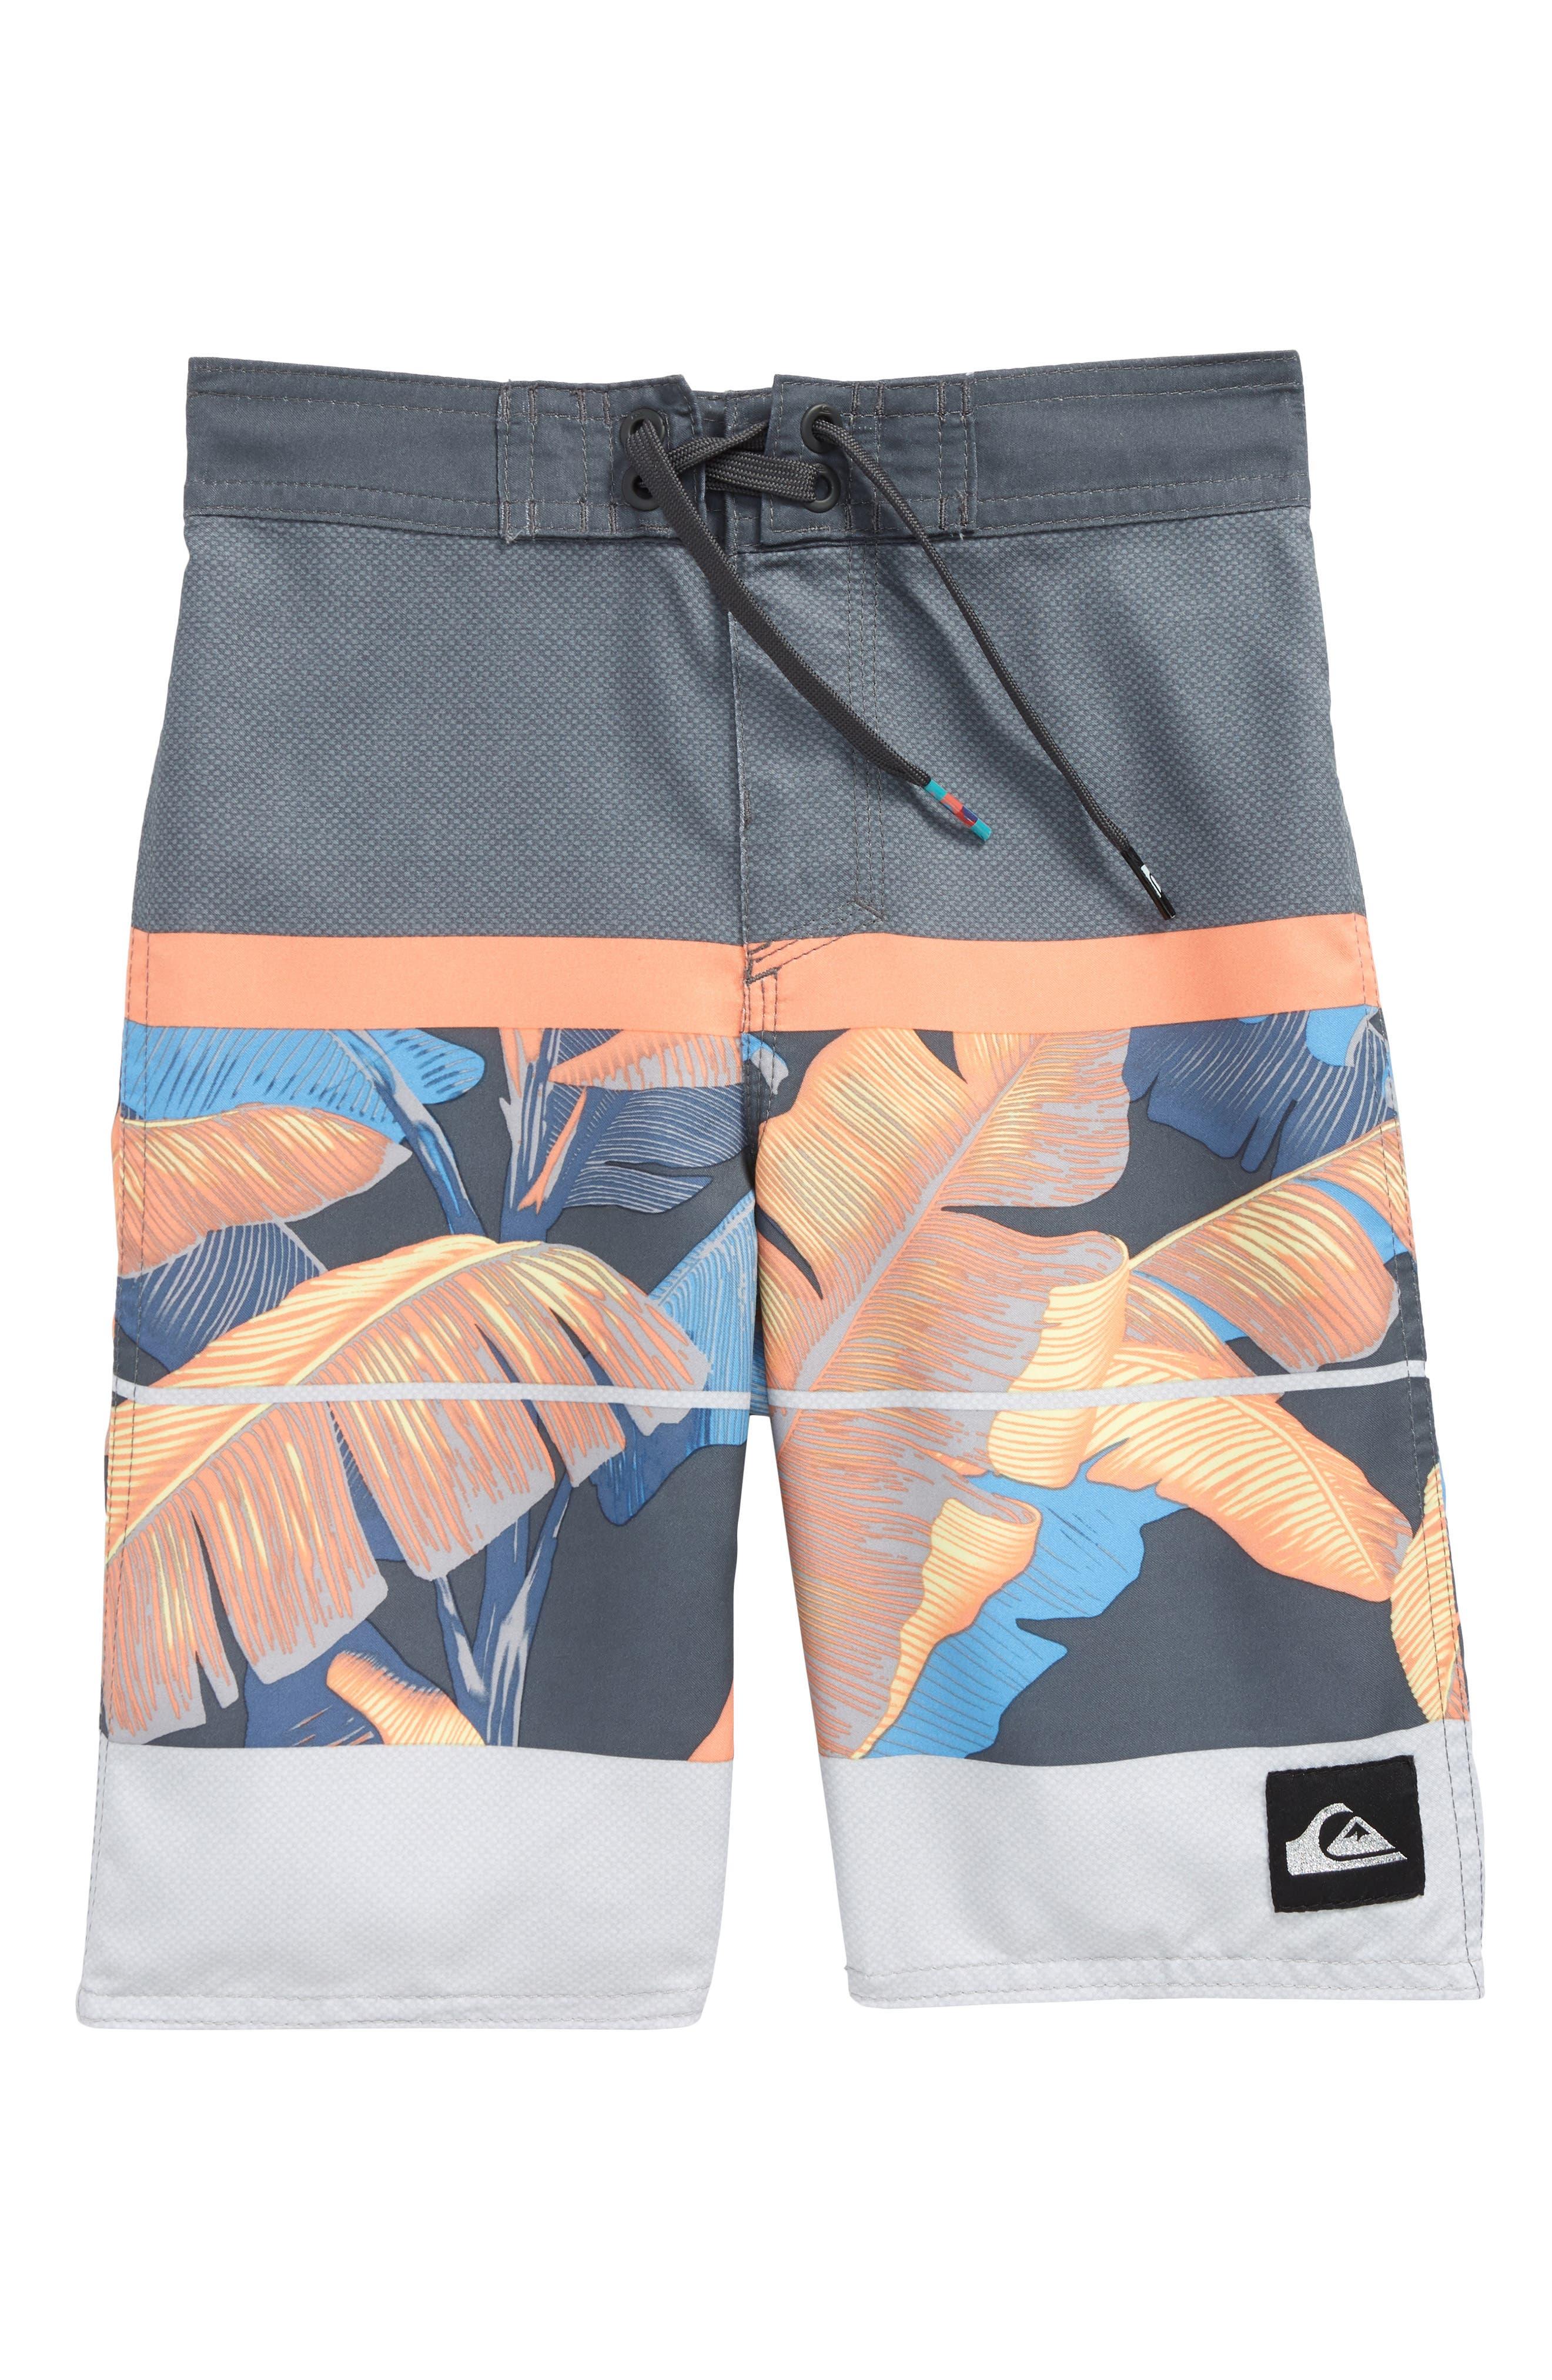 Slab Island Board Shorts,                         Main,                         color, 020